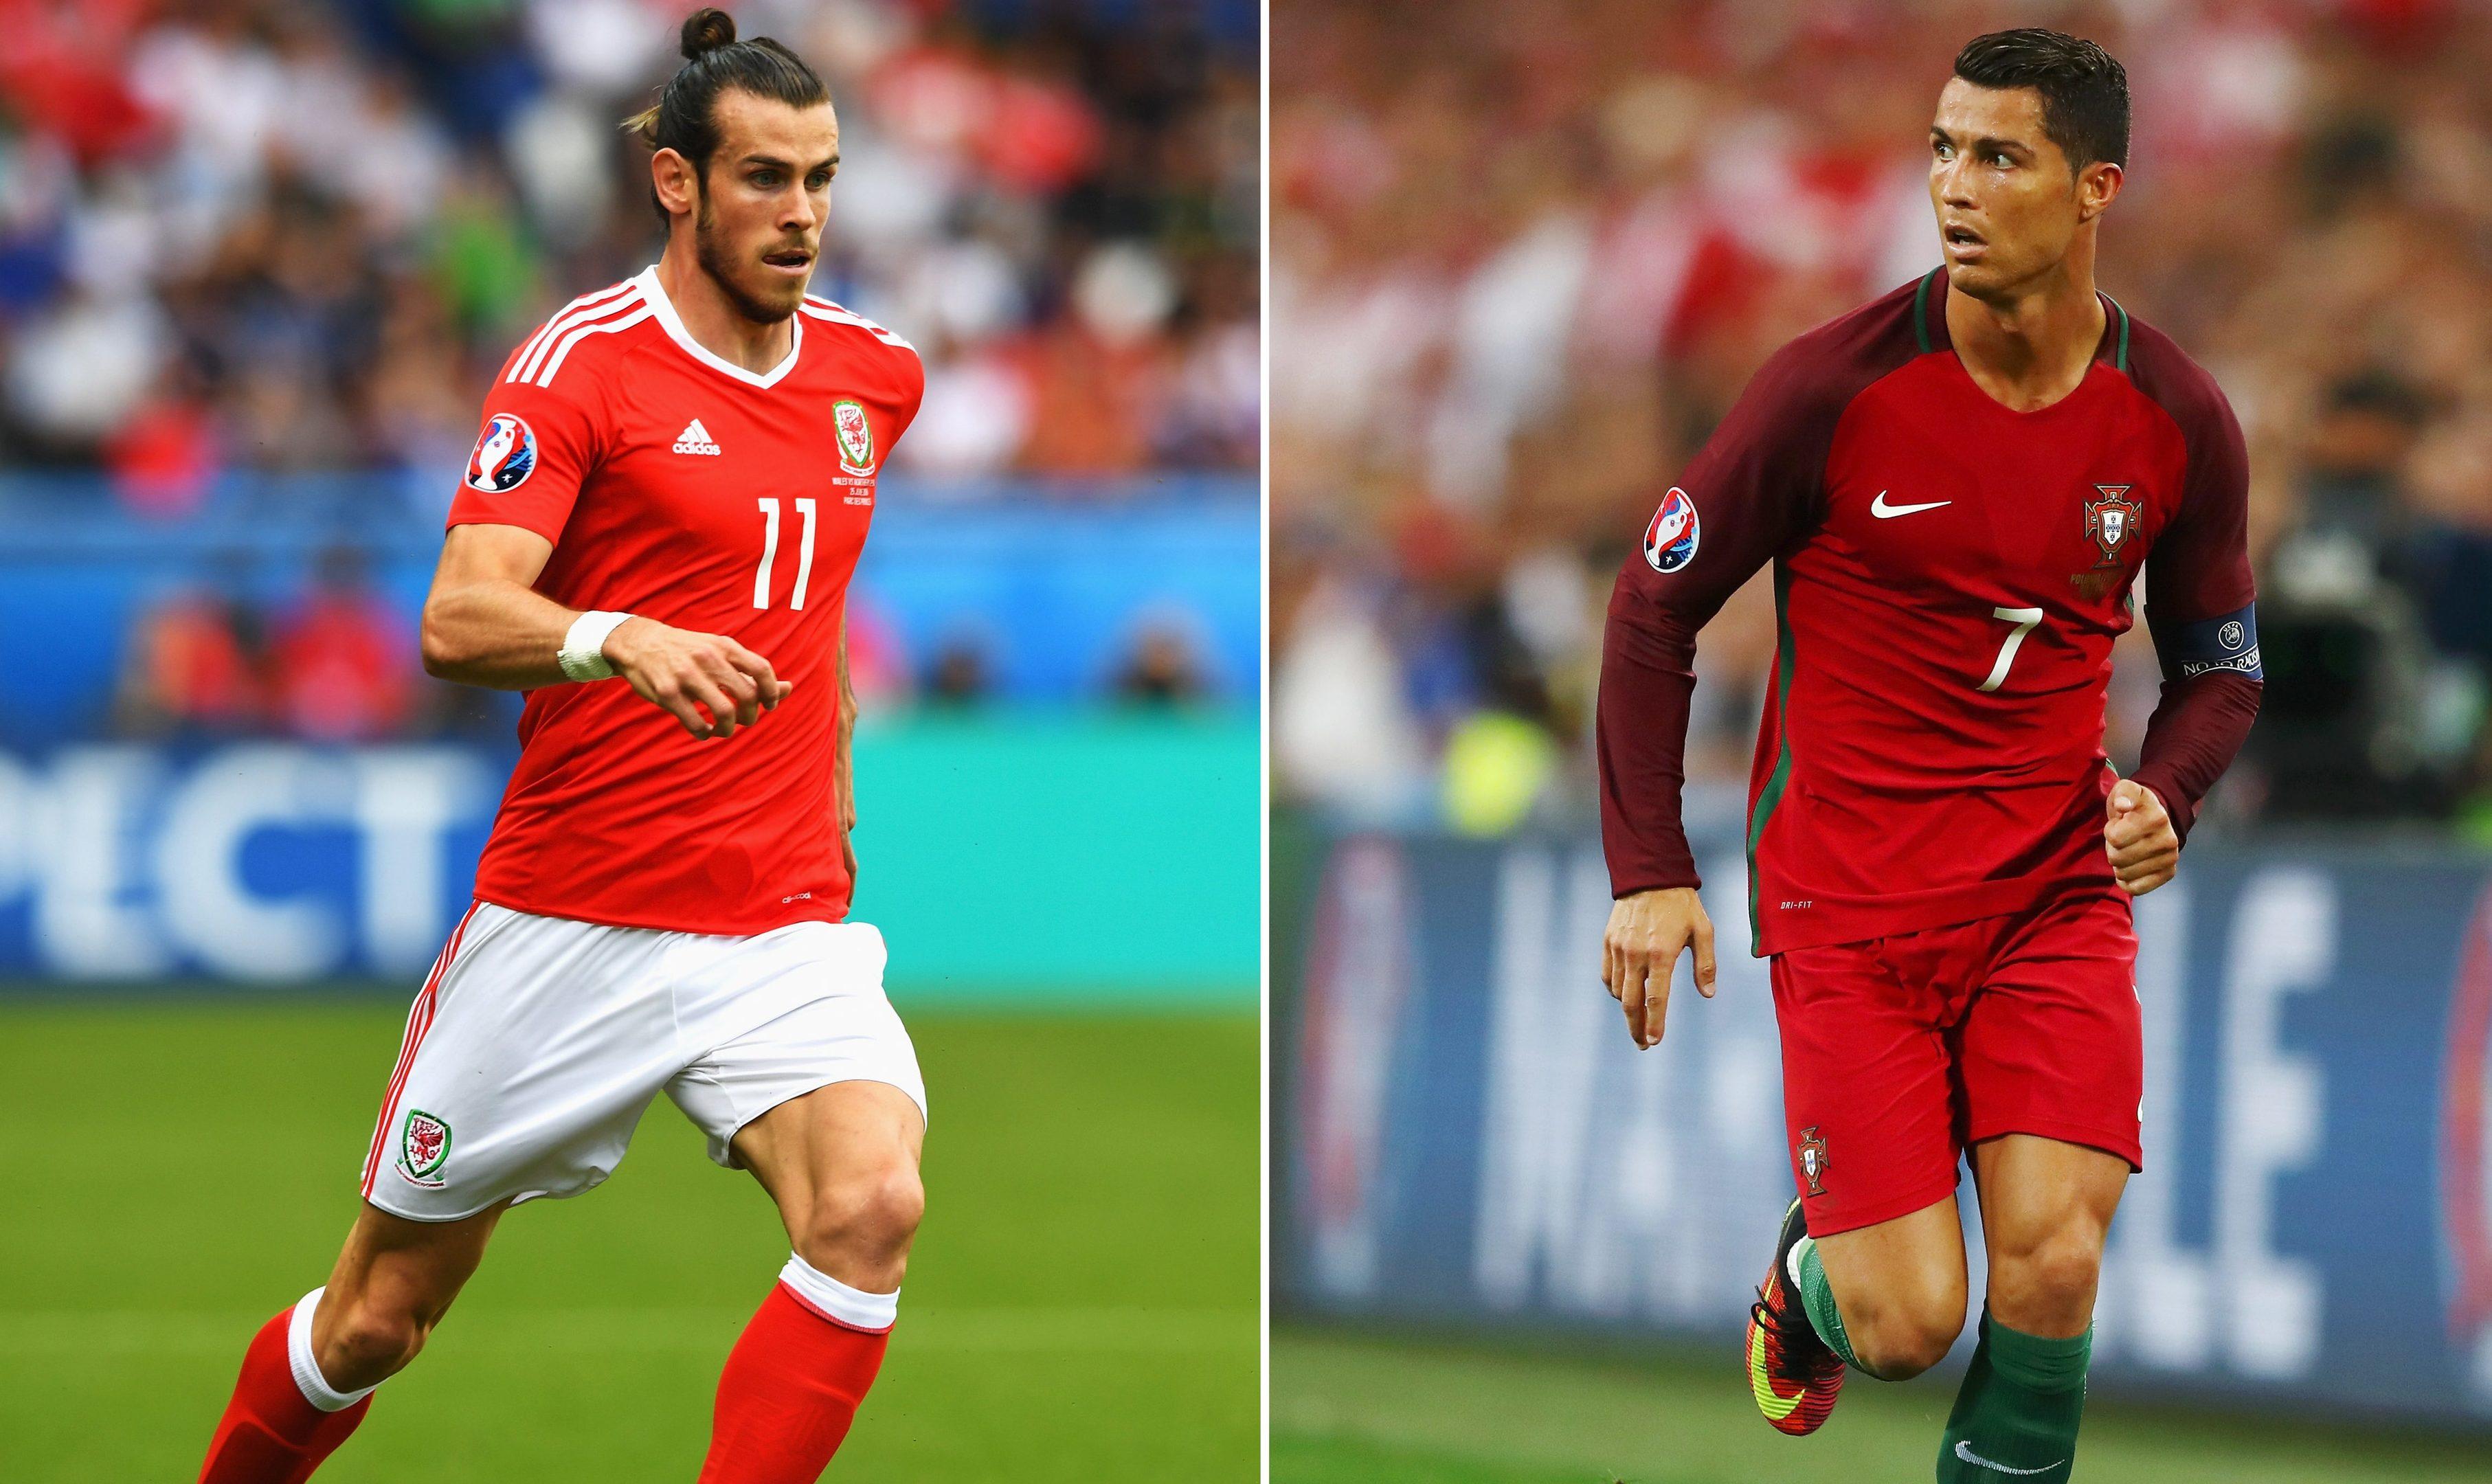 Gareth Bale (L) and Cristiano Ronaldo (Lars Baron/Getty Images)